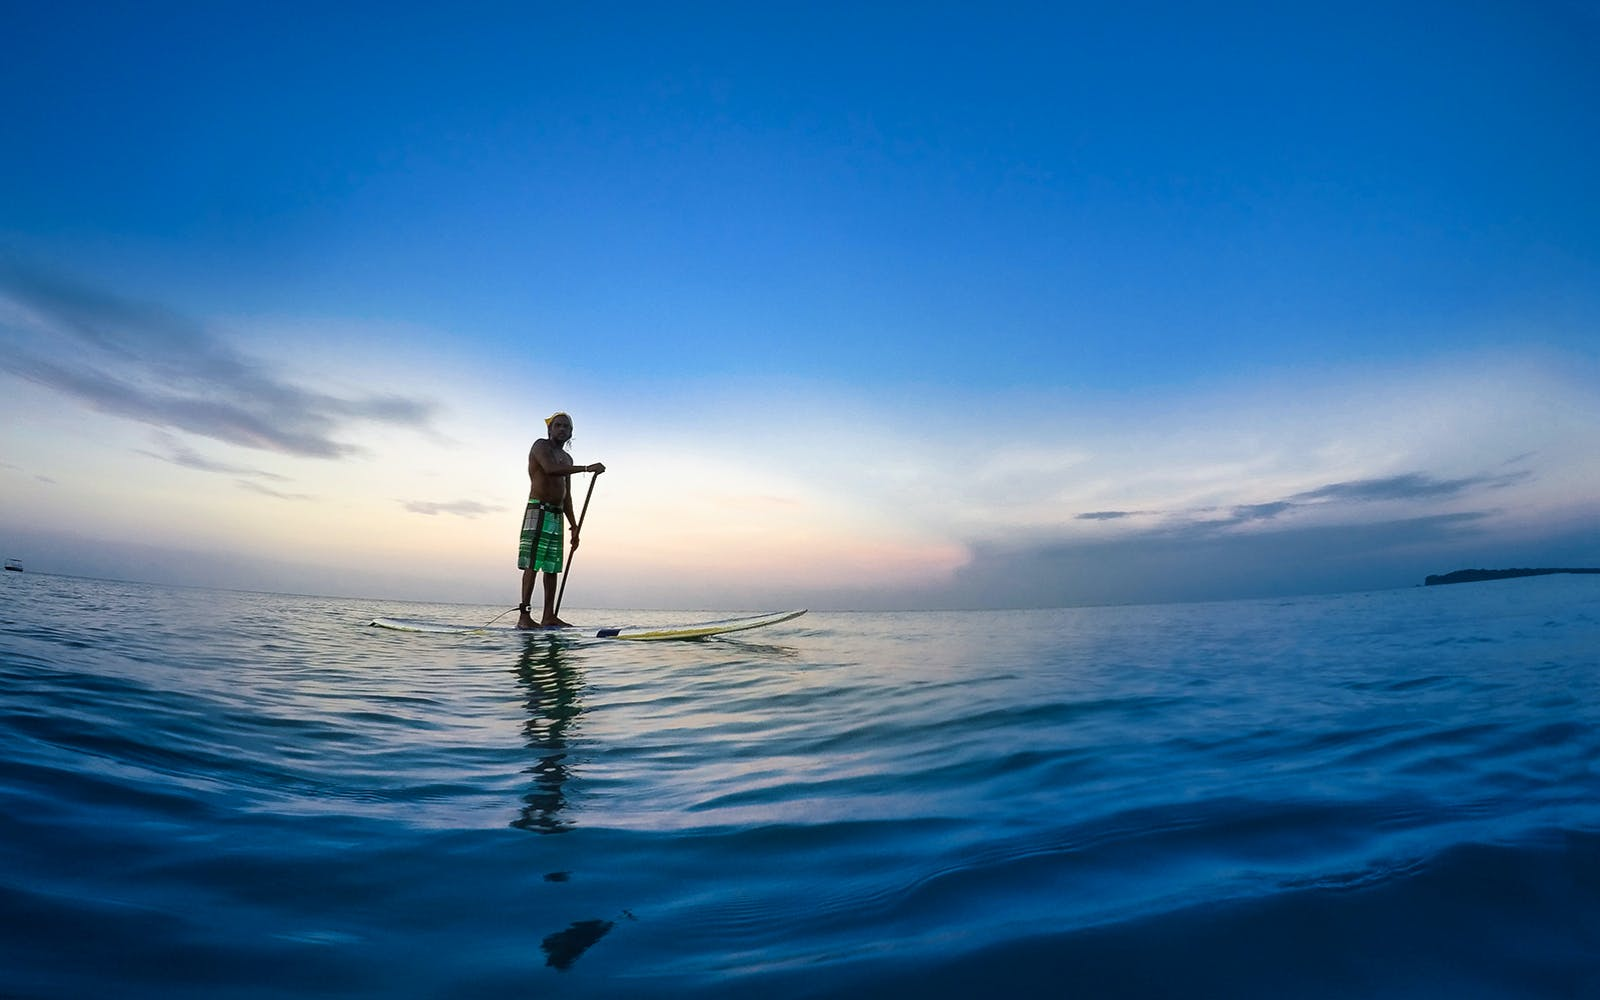 Water sports in Dubai - paddleboarding